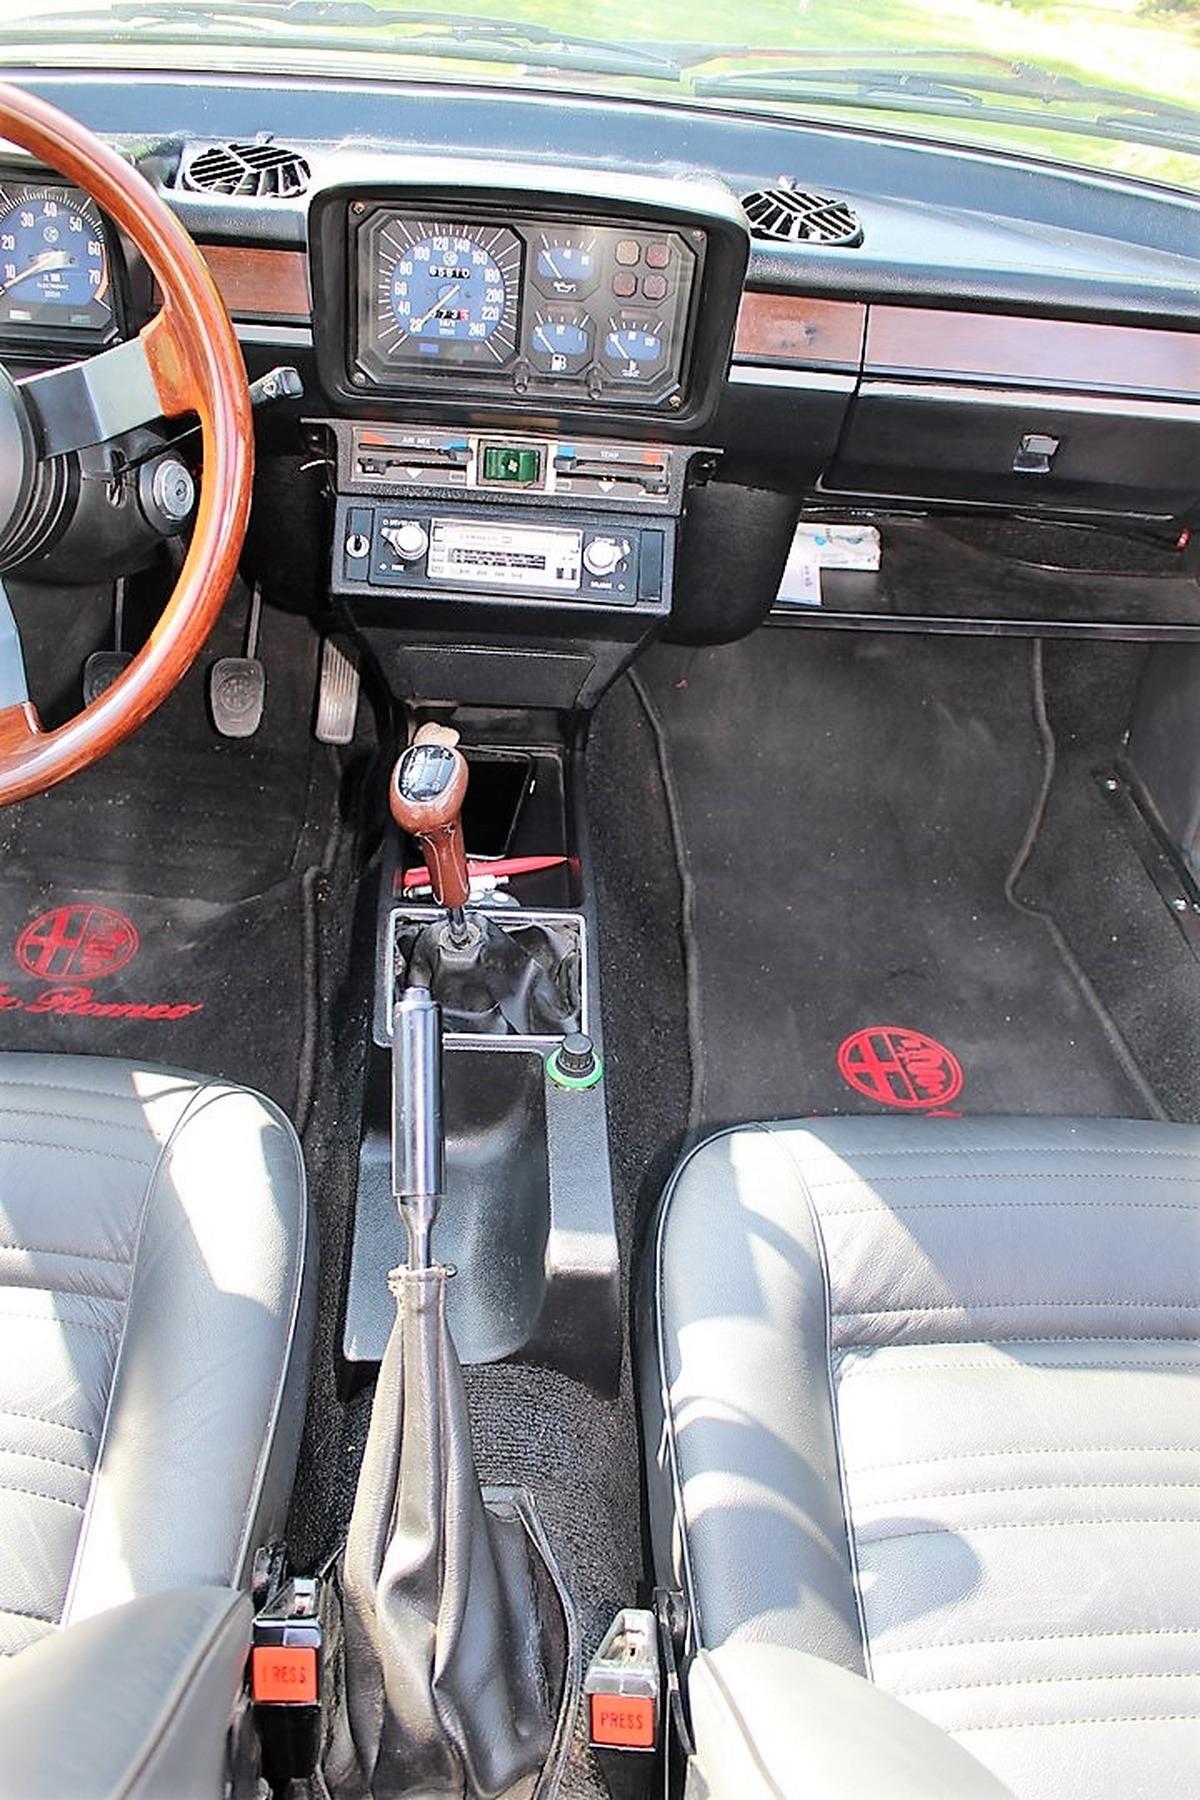 Alfa Romeo Gtv ALFETTA 2.0 132 cv RESTAURER